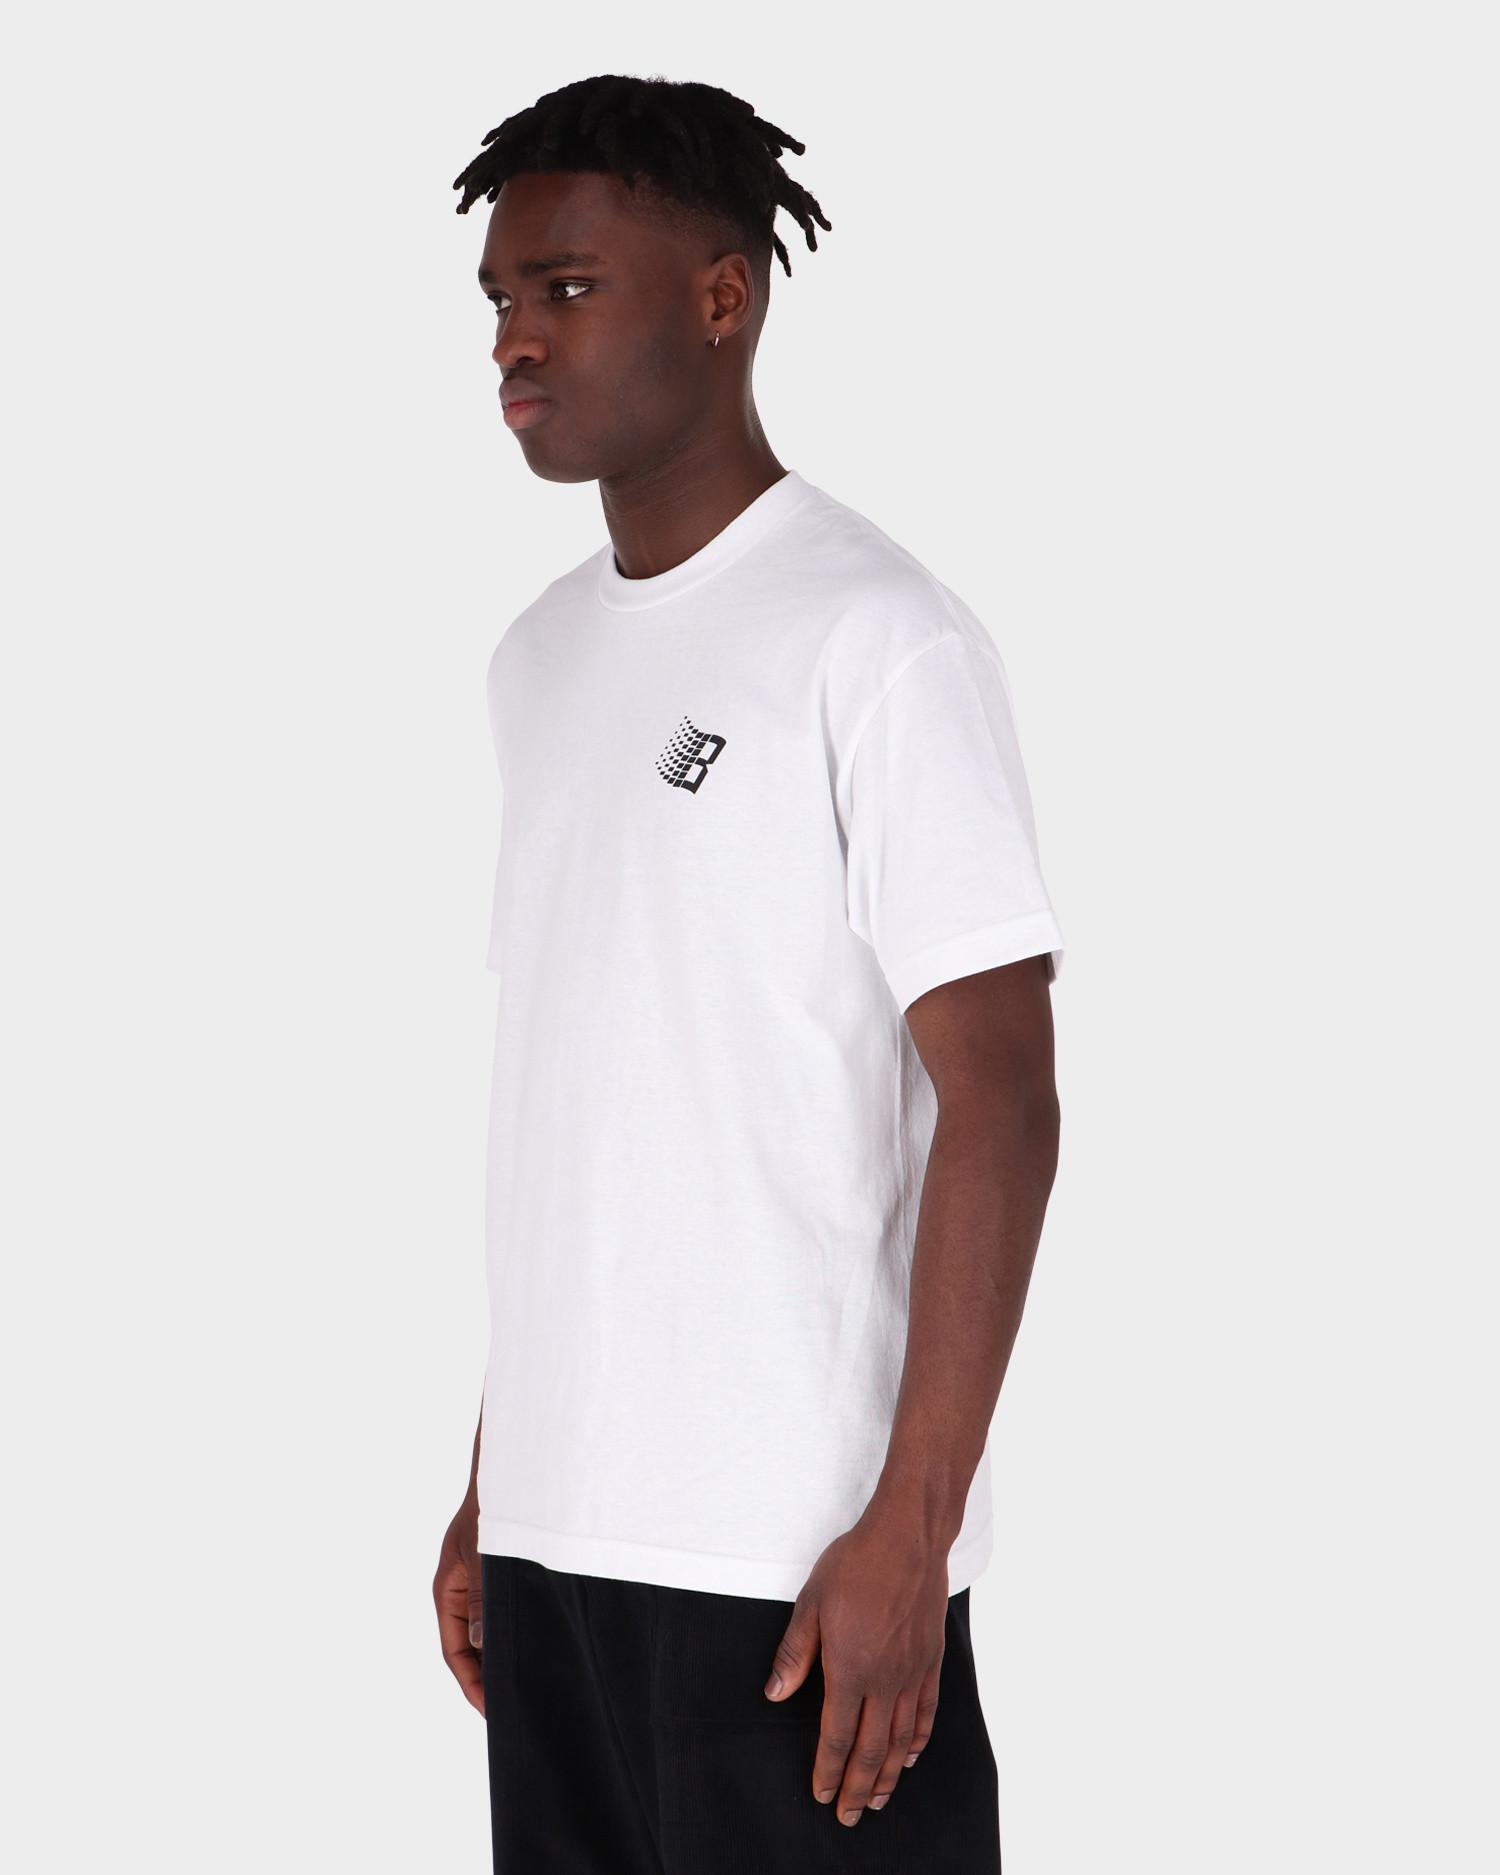 Bronze Smiley B Logo Tee Back & Front Print White